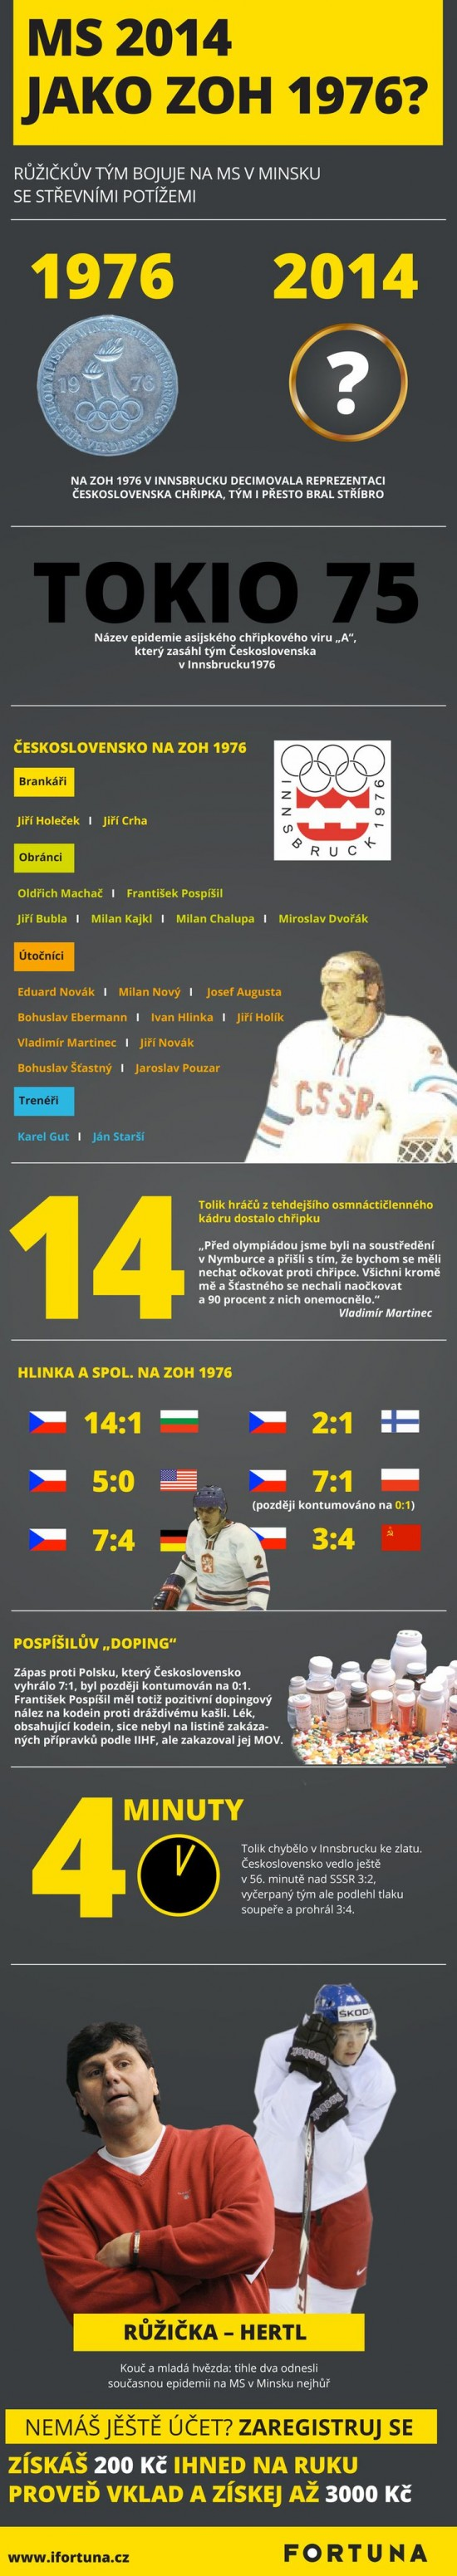 MS 2014 jako ZOH 196 - infografika